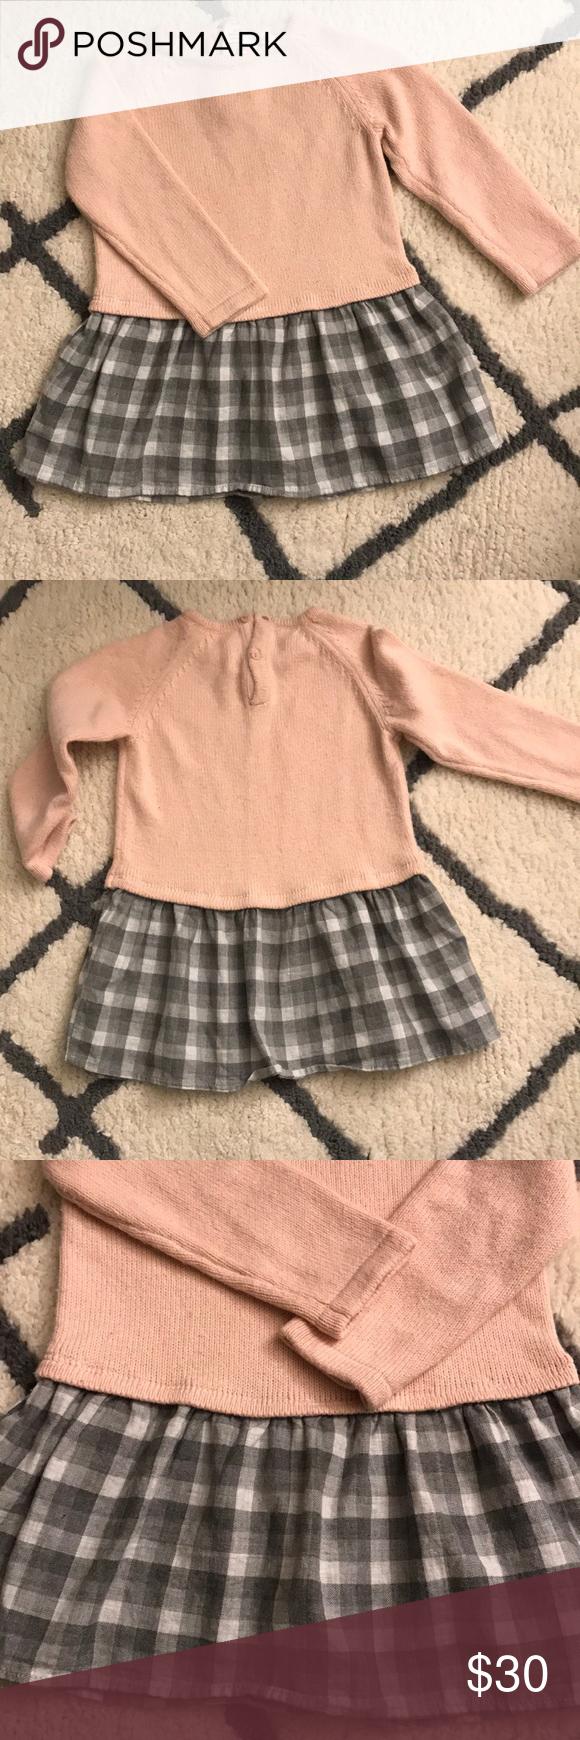 Zara baby girl dress🎀   Baby girl dress, Zara baby, Dresses